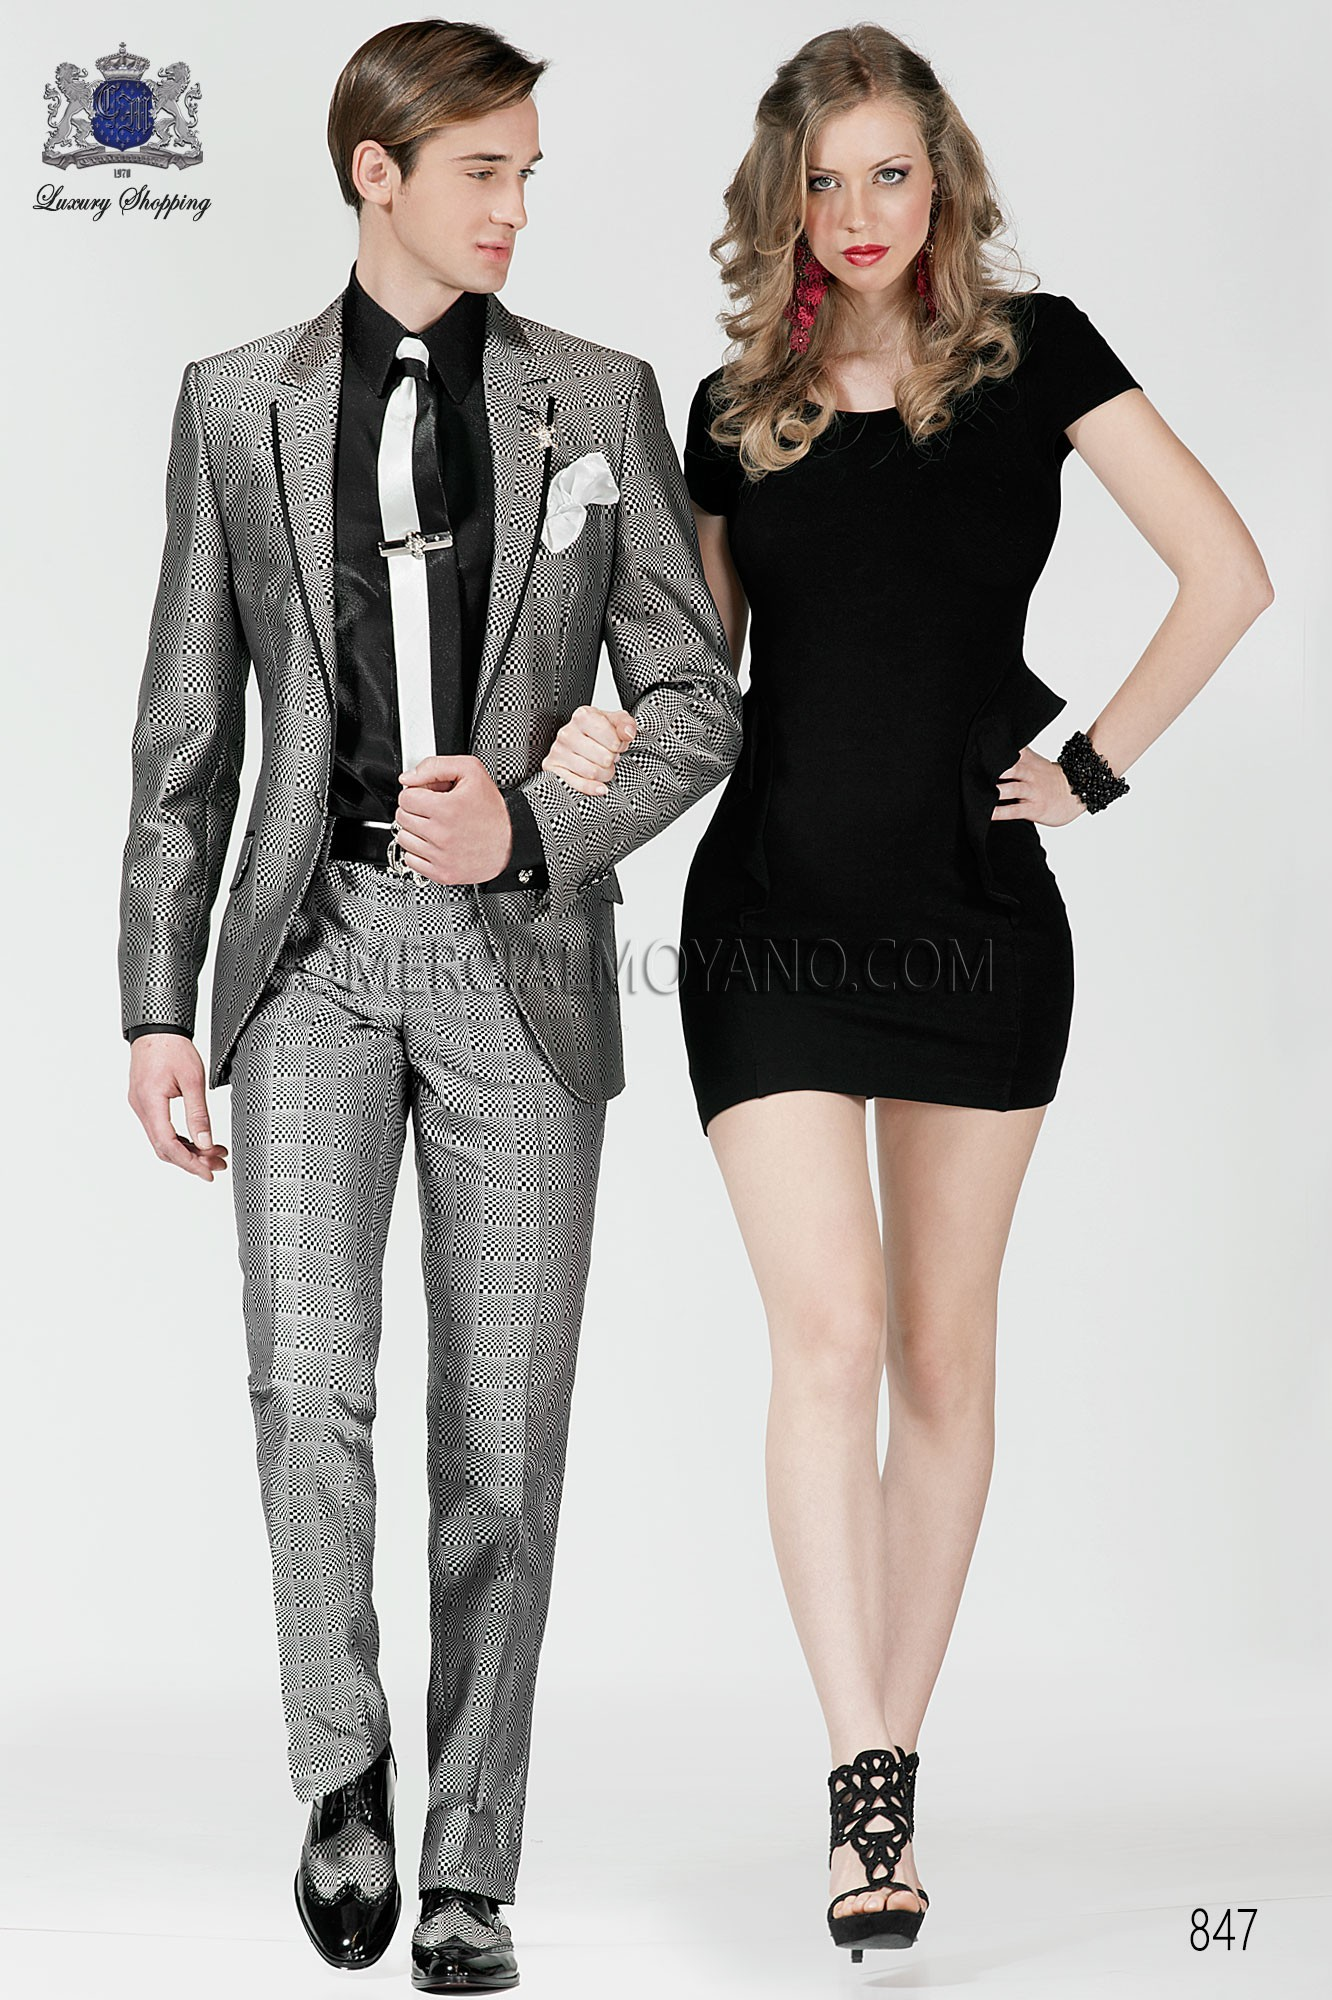 Emotion white-black men wedding suit model 847 Ottavio Nuccio Gala